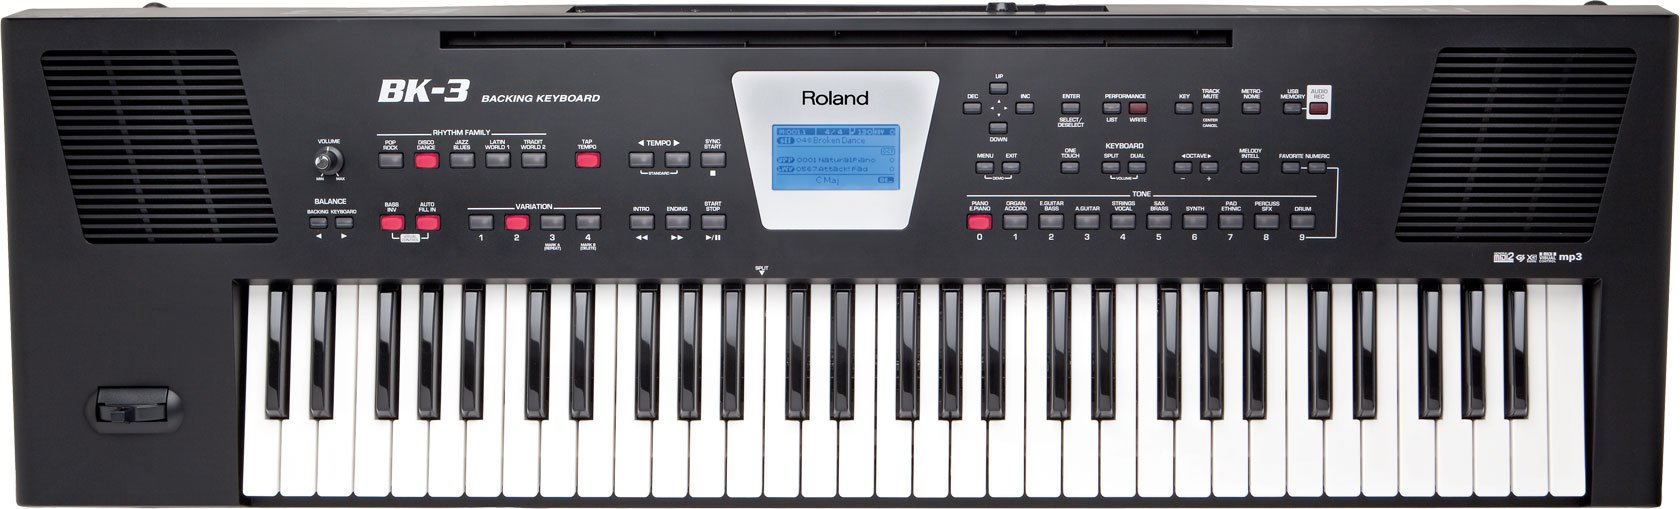 61-Key Backing Keyboard in Black